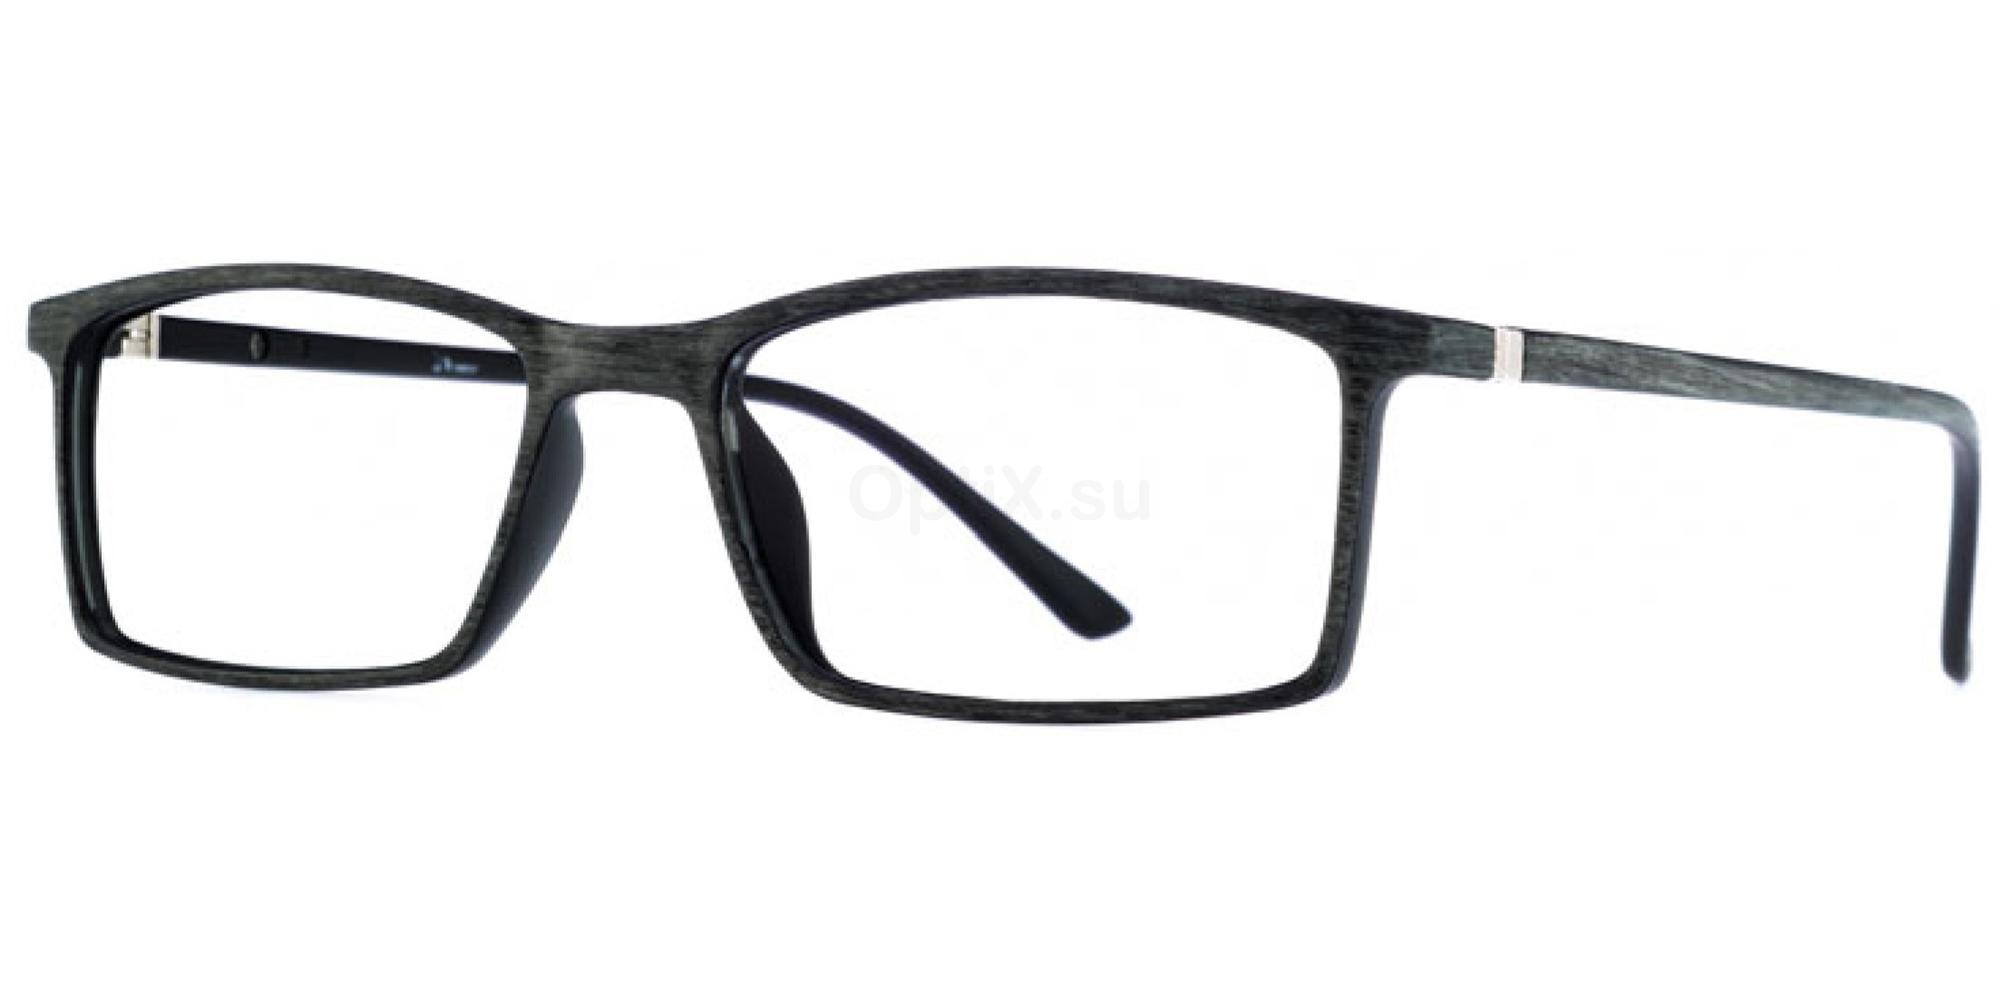 C1 Icy 282 , Icy Eyewear - Plastics